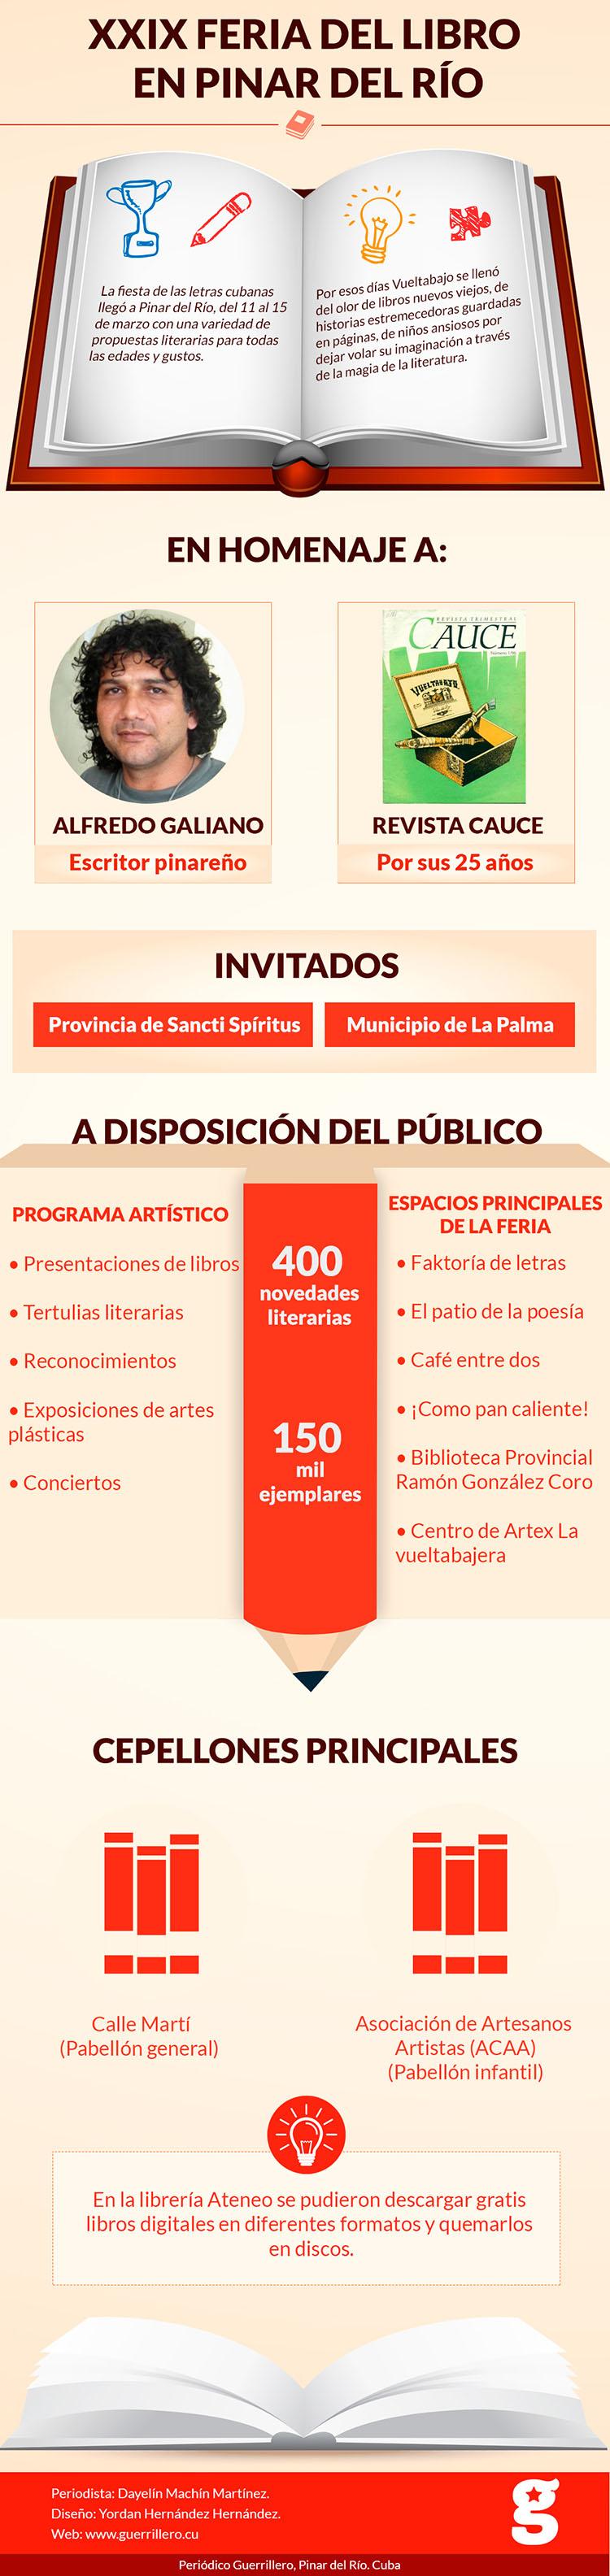 XXIX Feria del Libro en Pinar del Río